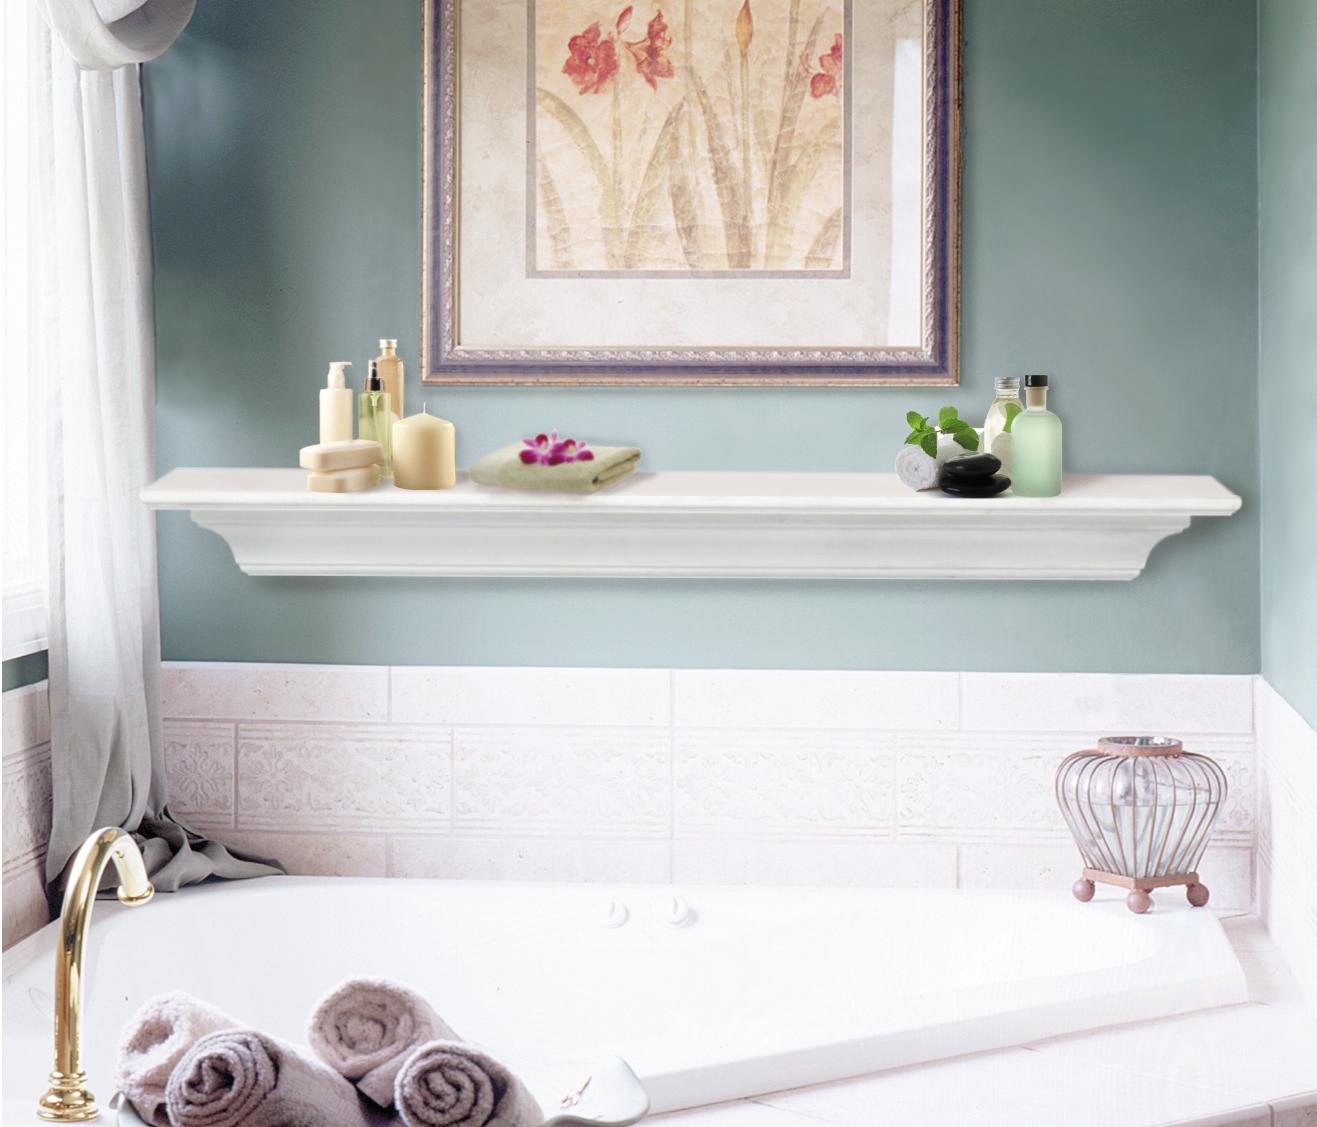 618-lifestyle-crestwood-white-paint-bathroom-shelf.jpg